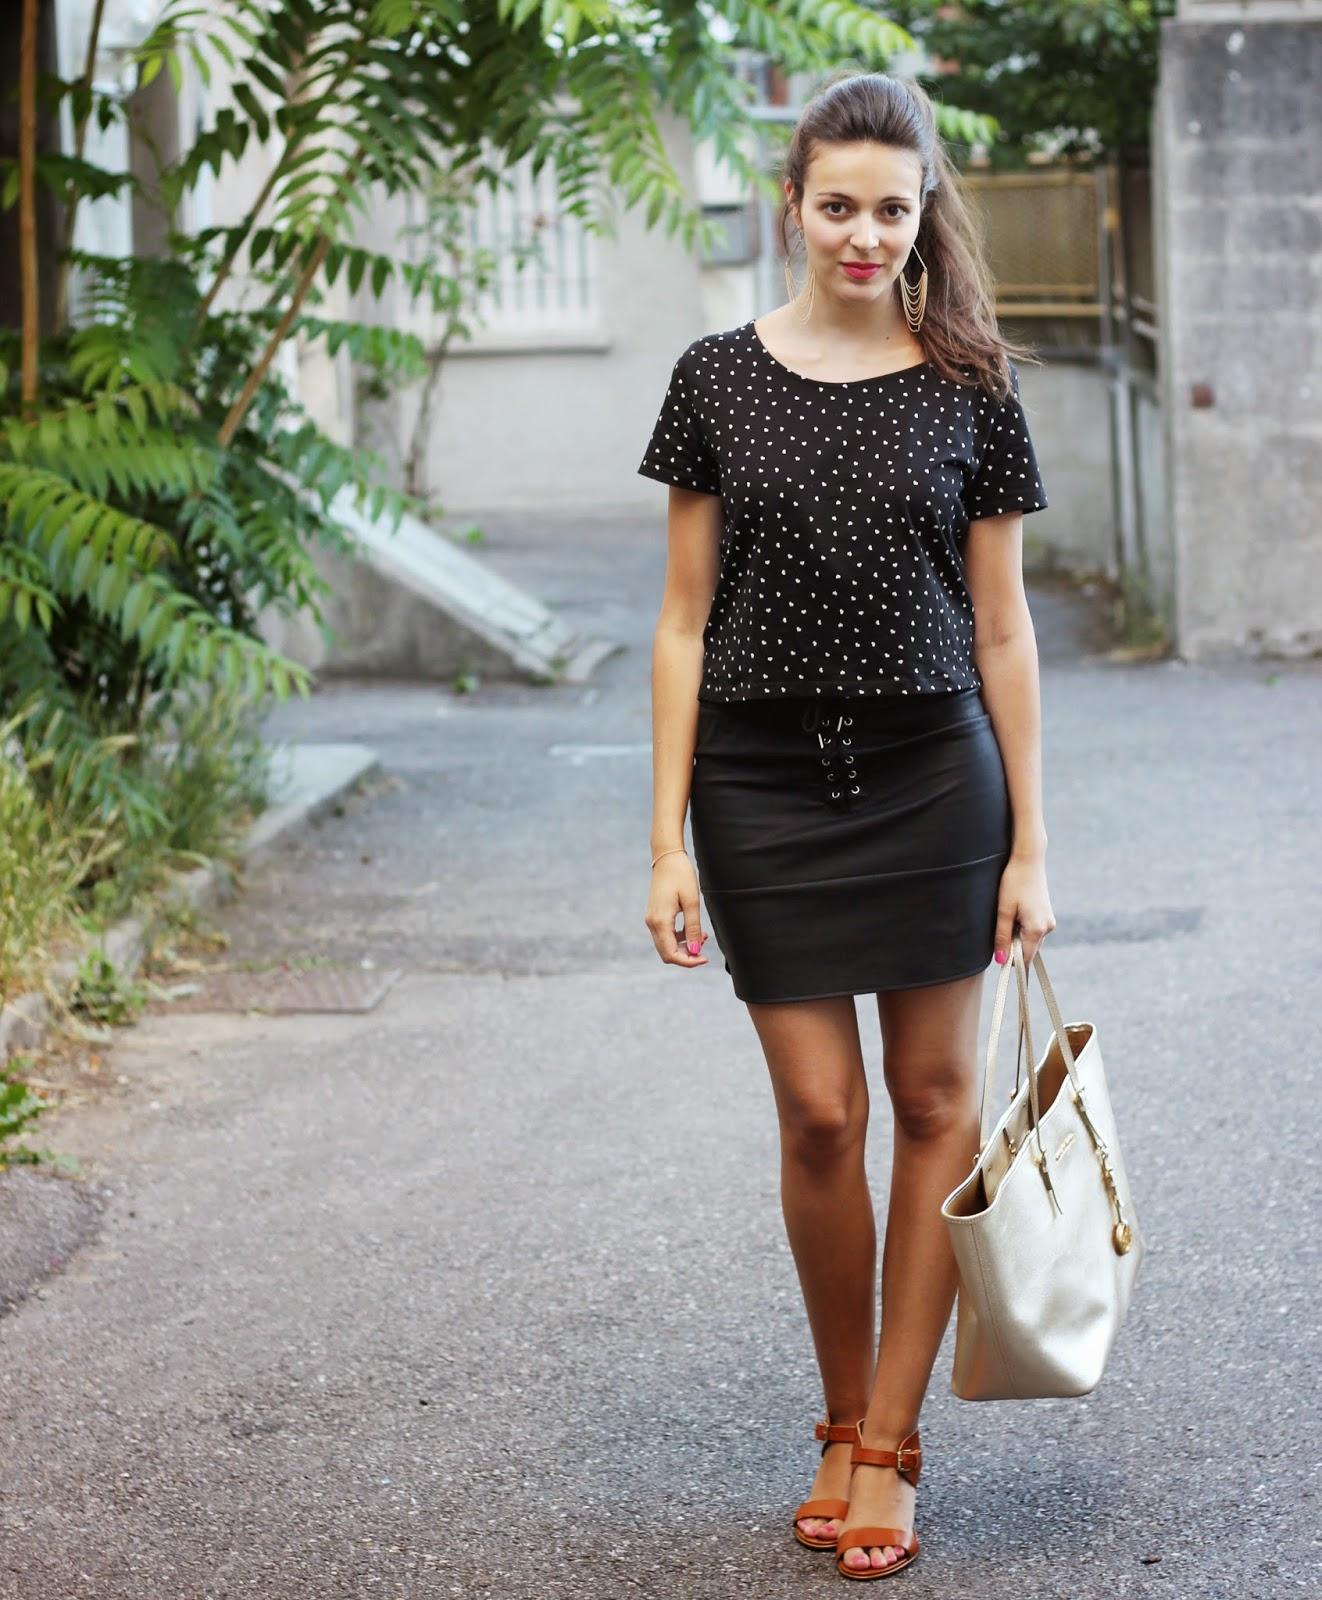 38f007a963634e Ma jupe similicuir / Les tendances by Marina - Blog mode, déco ...